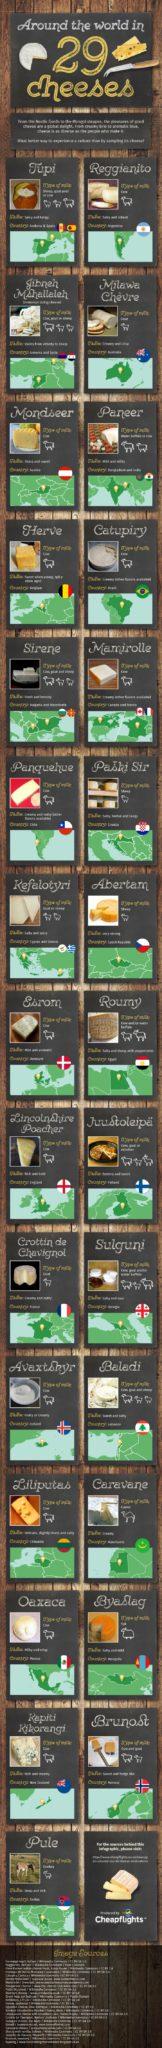 Around-the-world-in-29-cheeses-infographic-UK